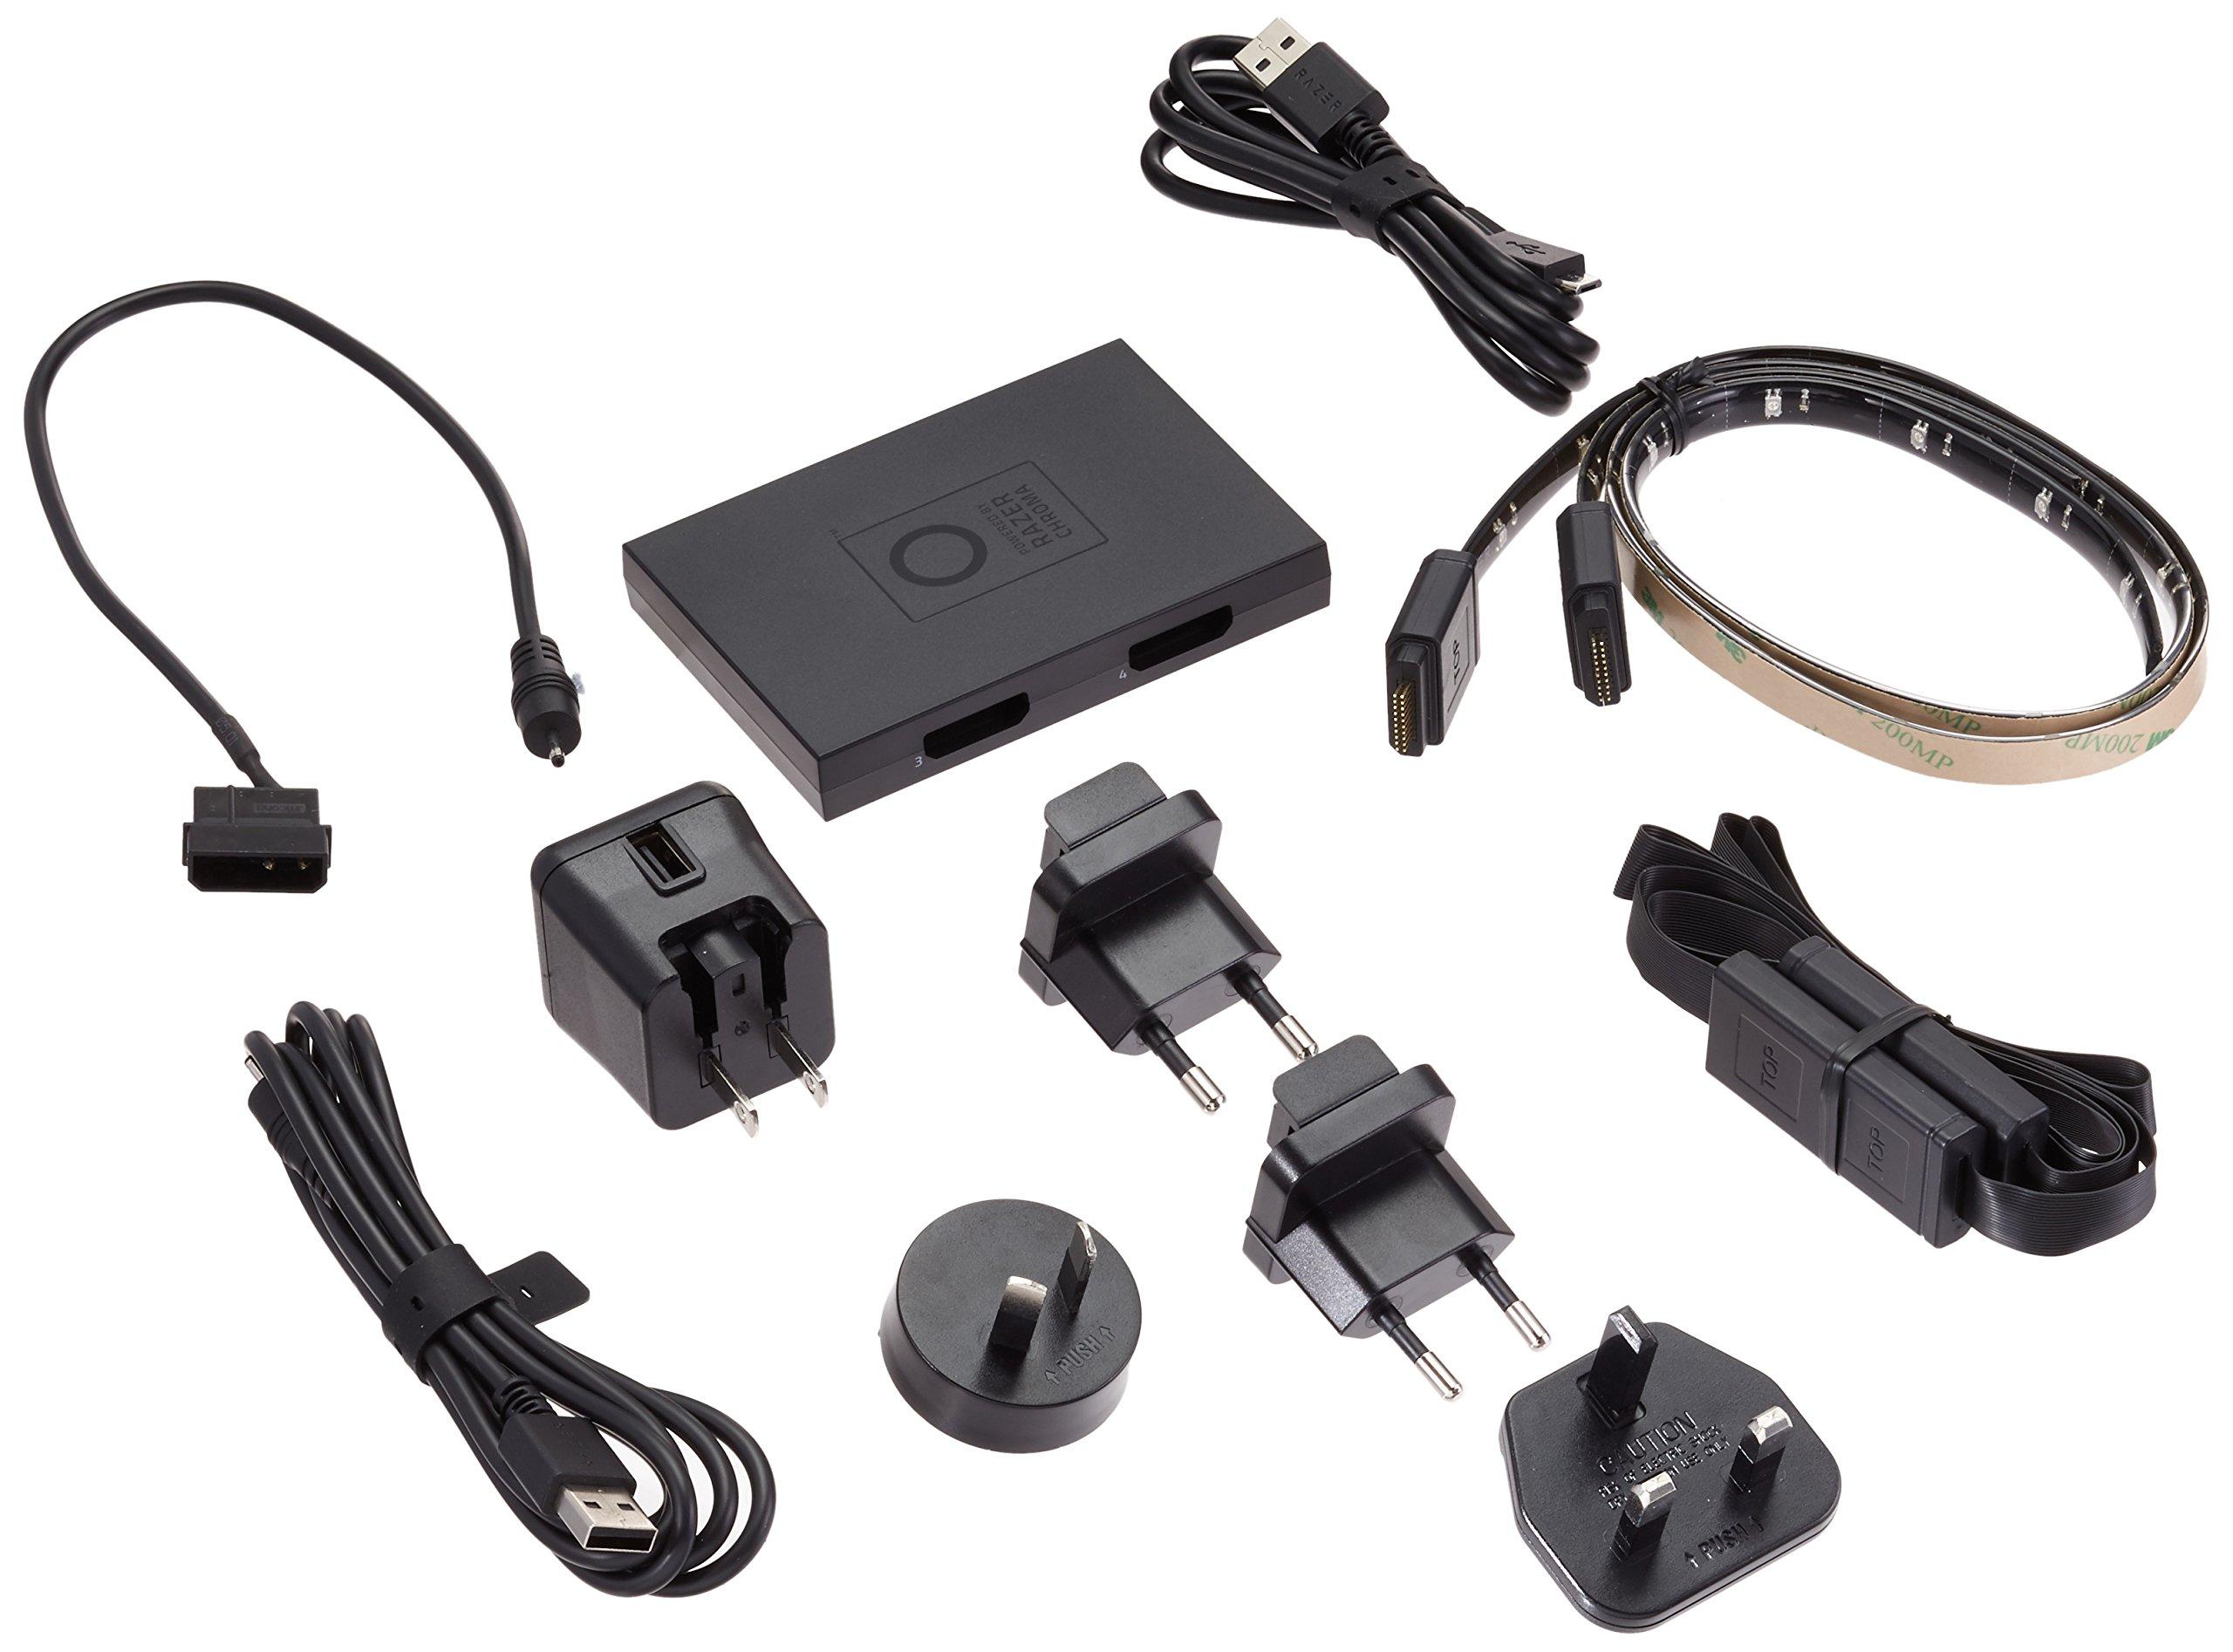 Razer RGB Chroma Hardware Development Kit